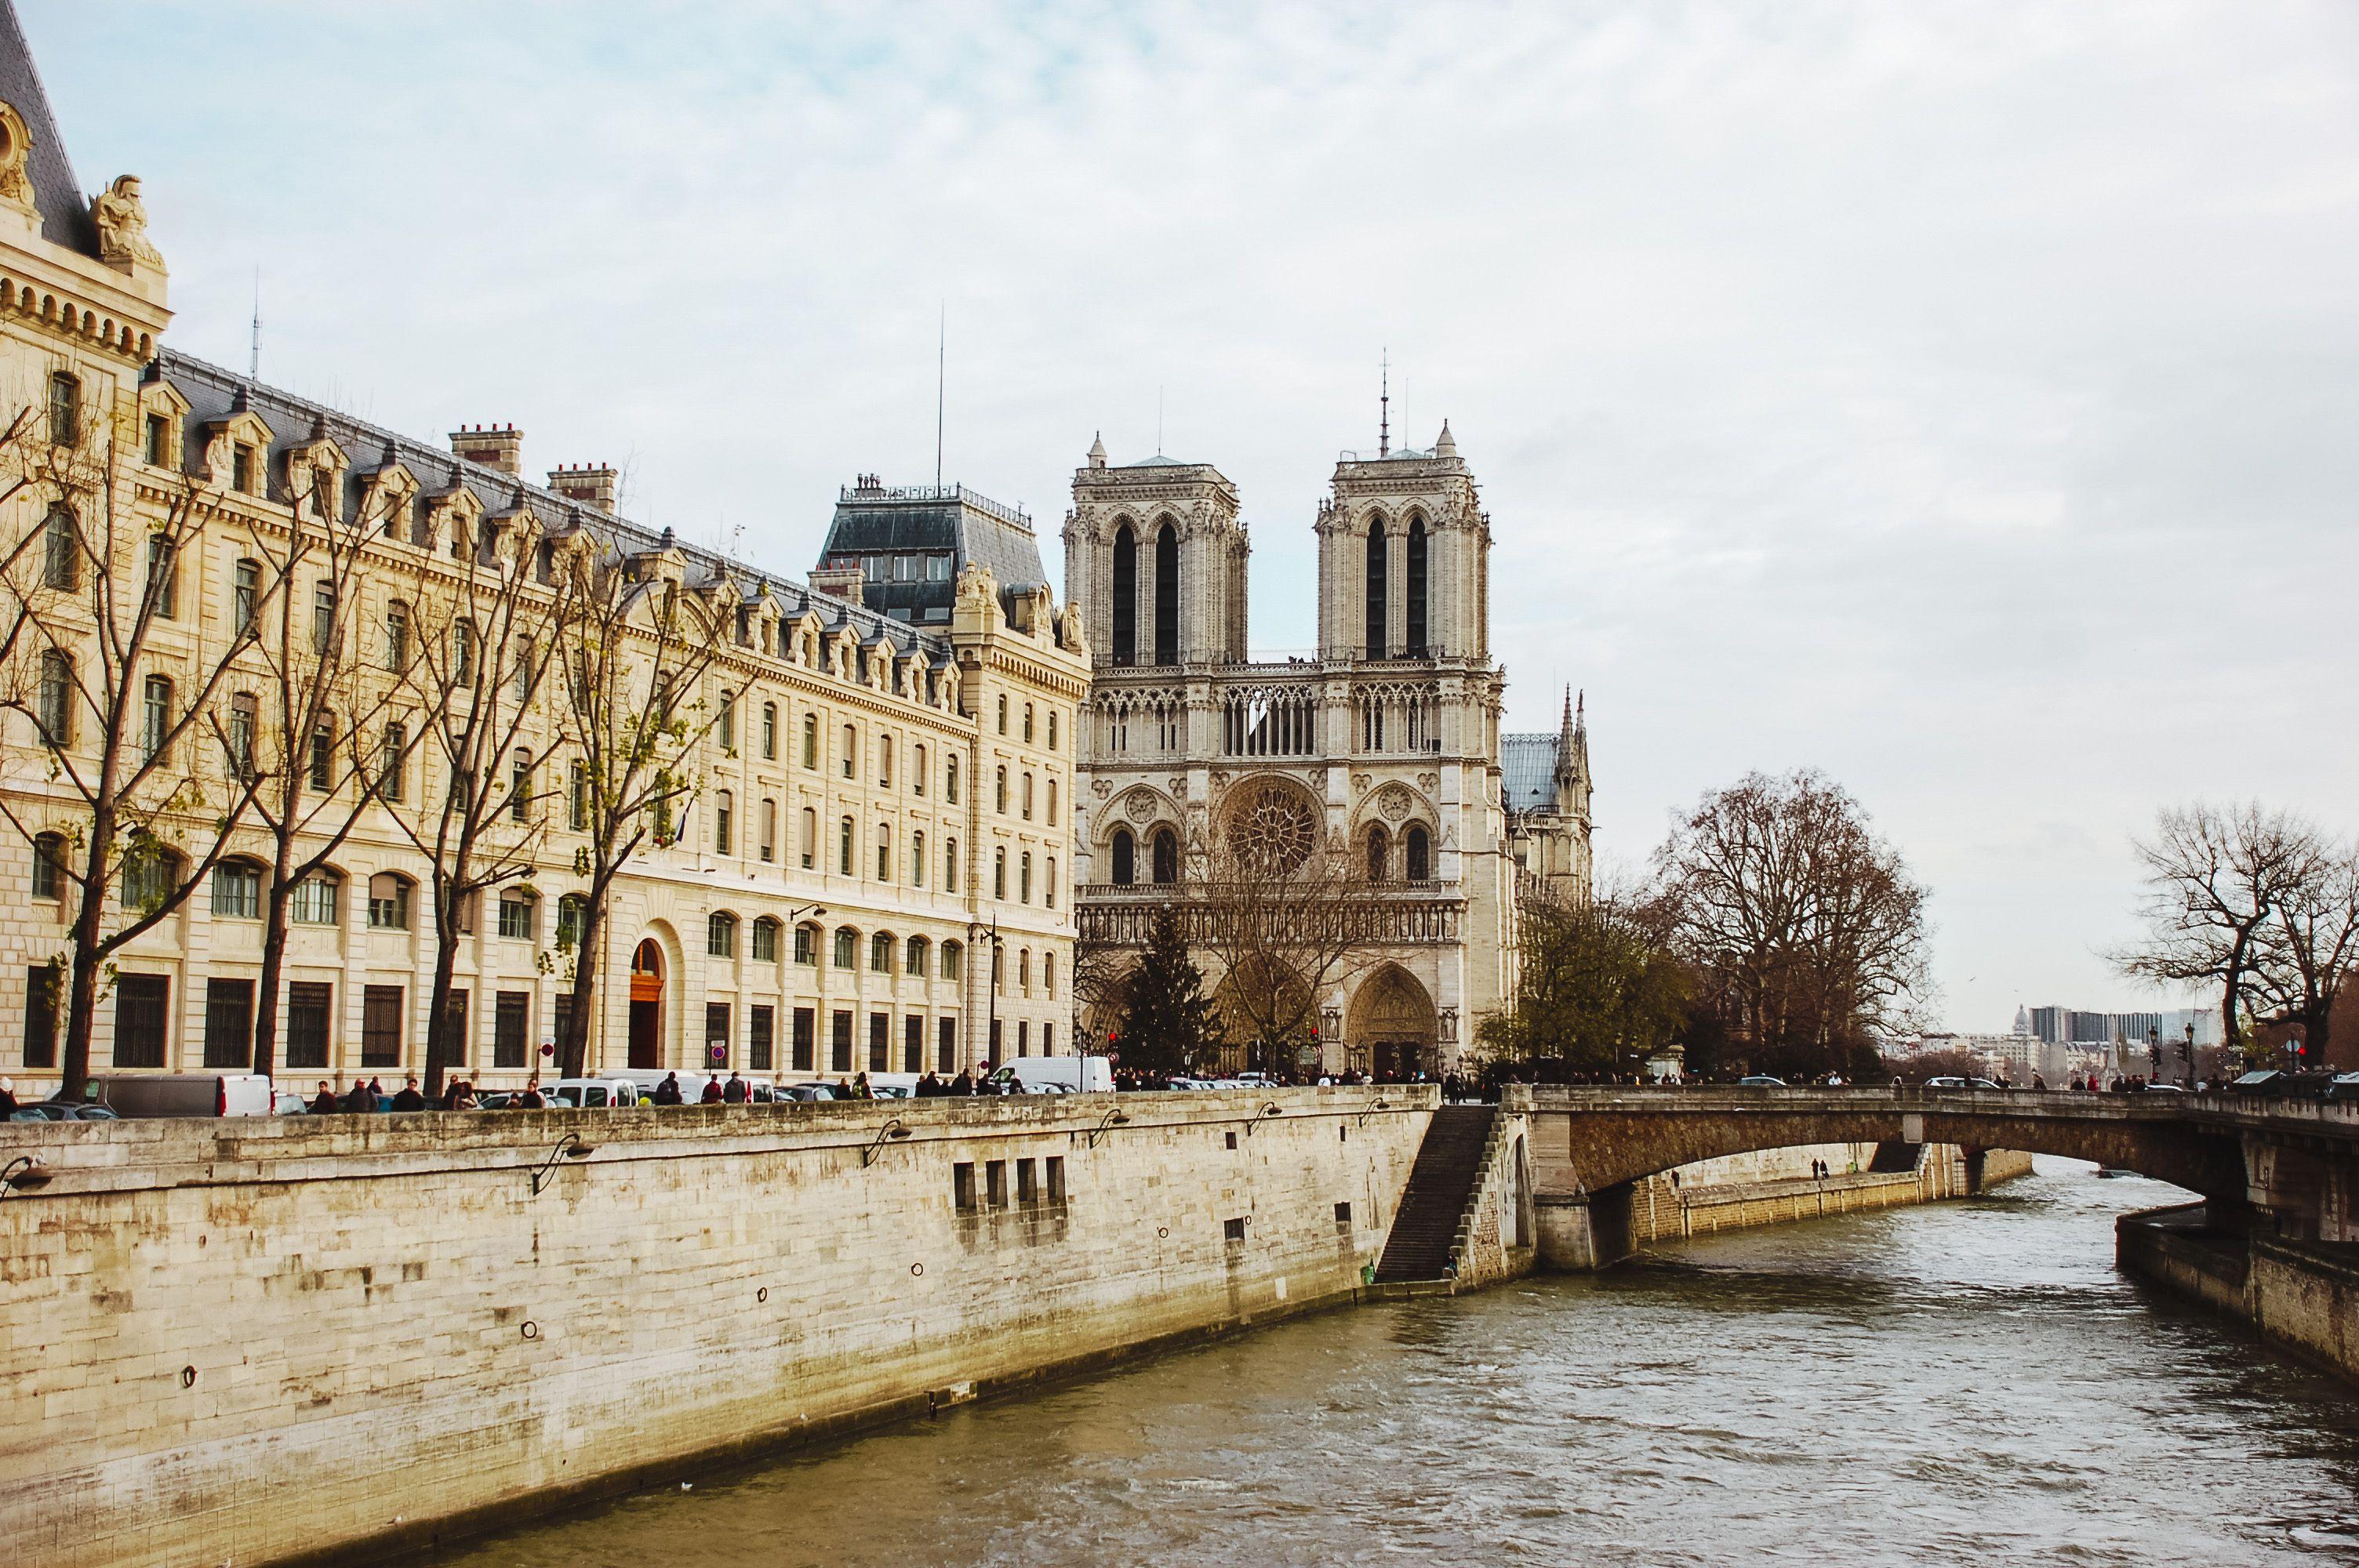 Notre Dame Cathedral Visitor Information